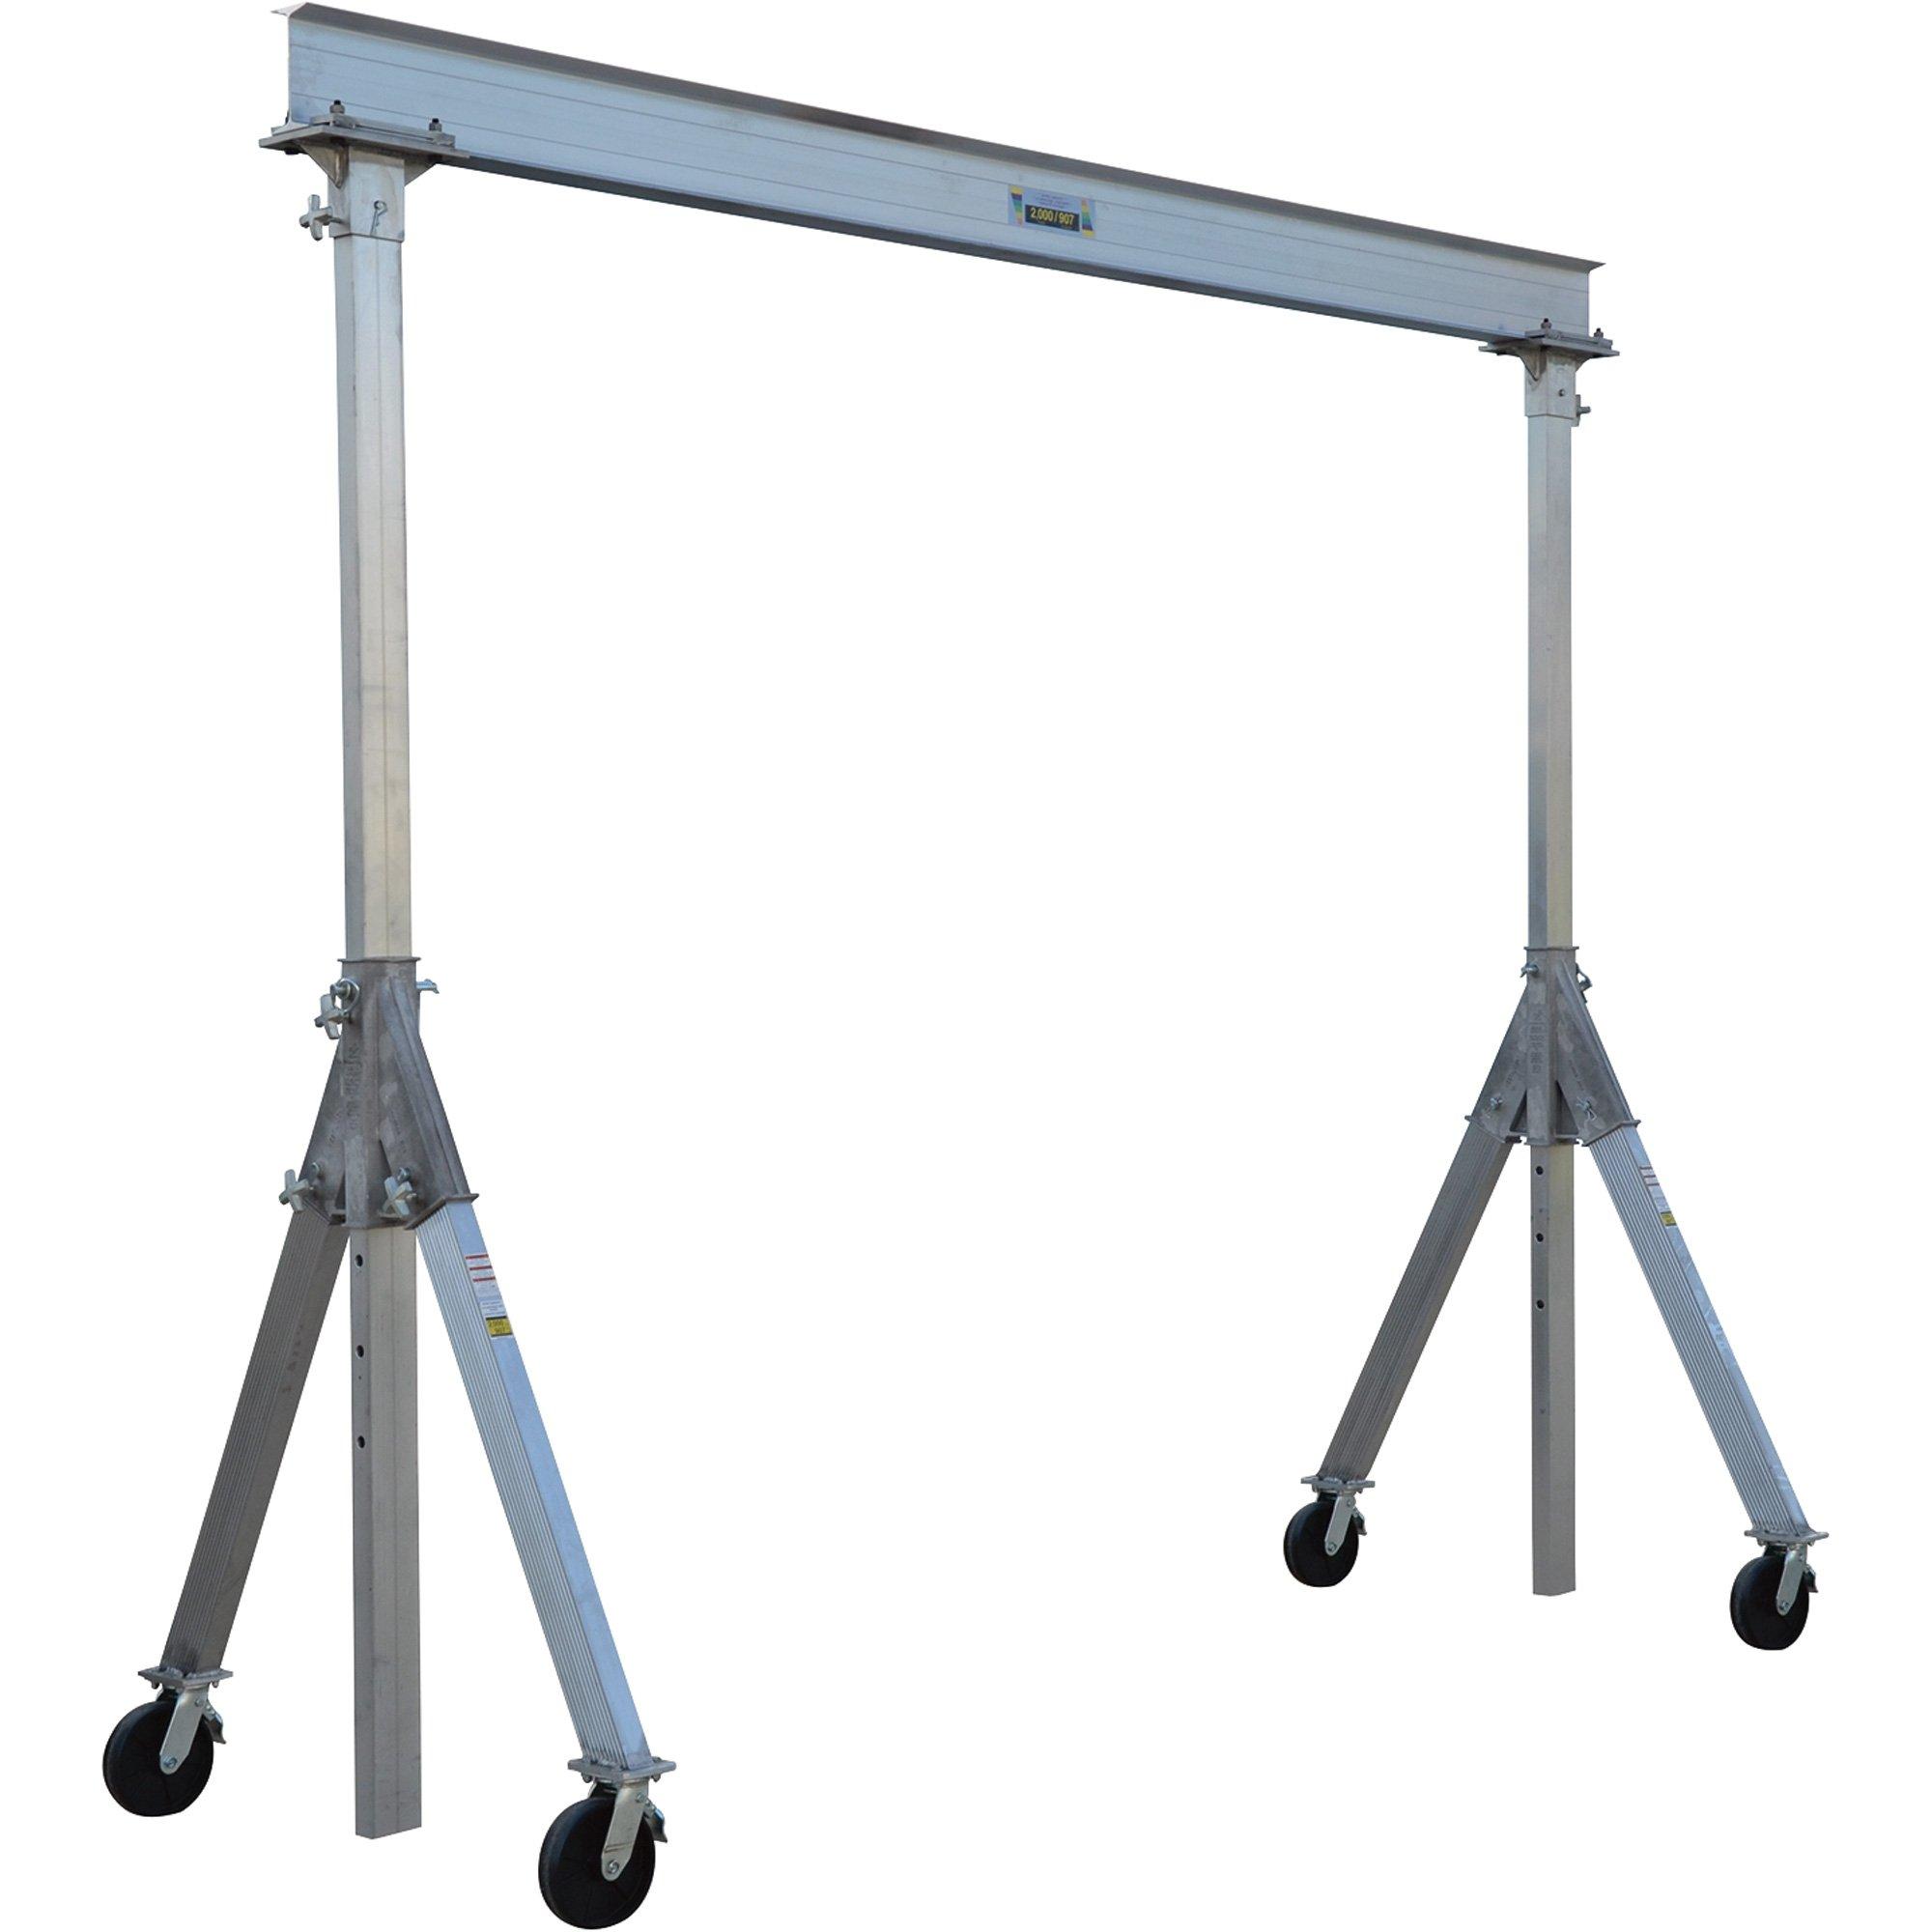 Vestil AHA-6-12-10 Aluminum Adjustable Gantry Crane, 6000 lb. Capacity, 12' Overall Beam, 96'' Usable Trolley Travel Distance, Under I-Beam Range 982''-120'', 134'' Height